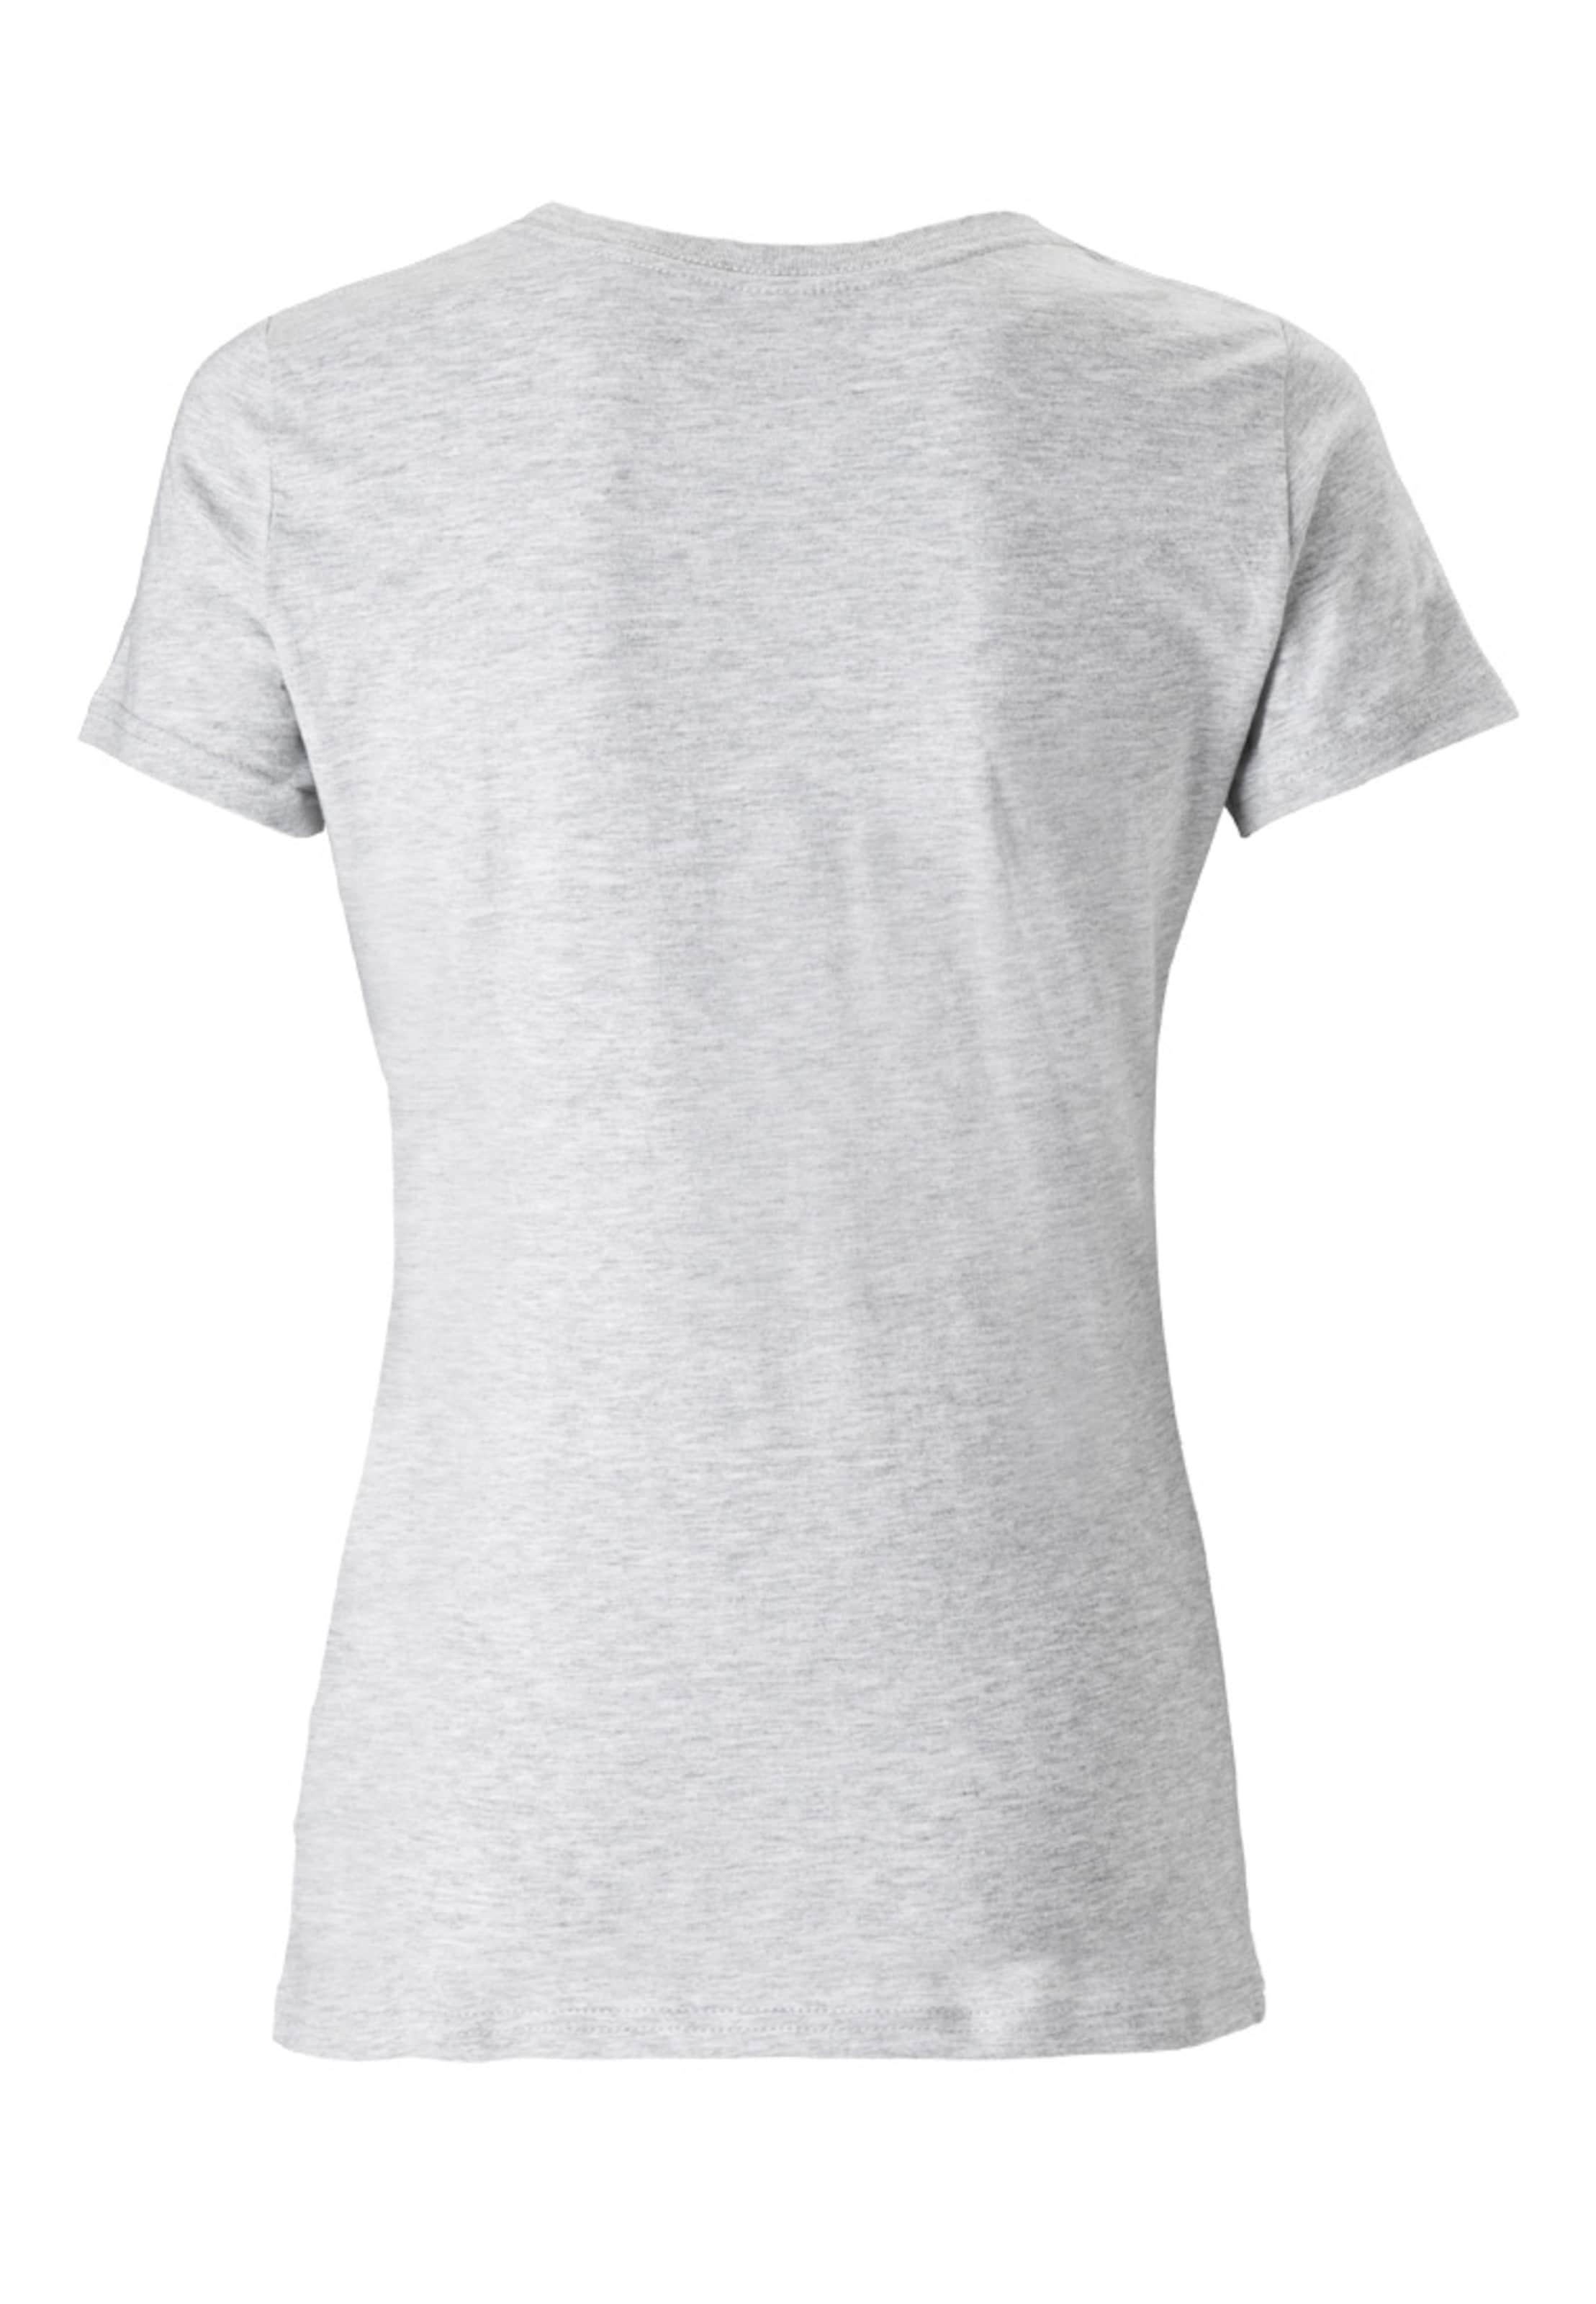 'captain America' T GraumeliertMischfarben Logoshirt In shirt SUzGMpVq